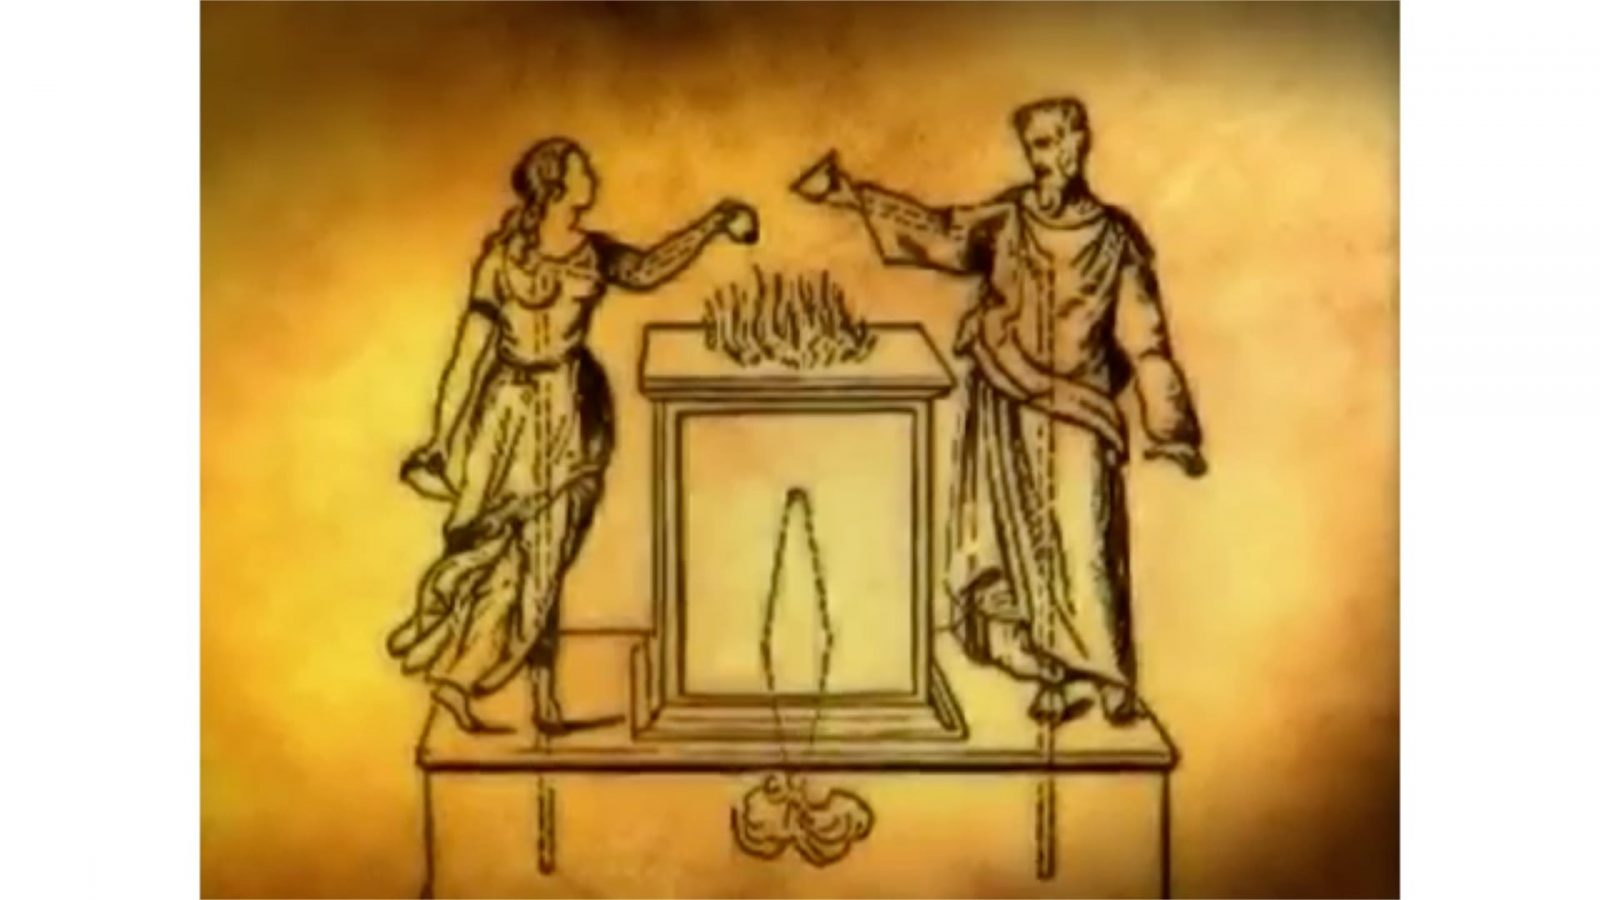 «Вездеход»: изобретения Древней Греции. Герон Александрийский. 1